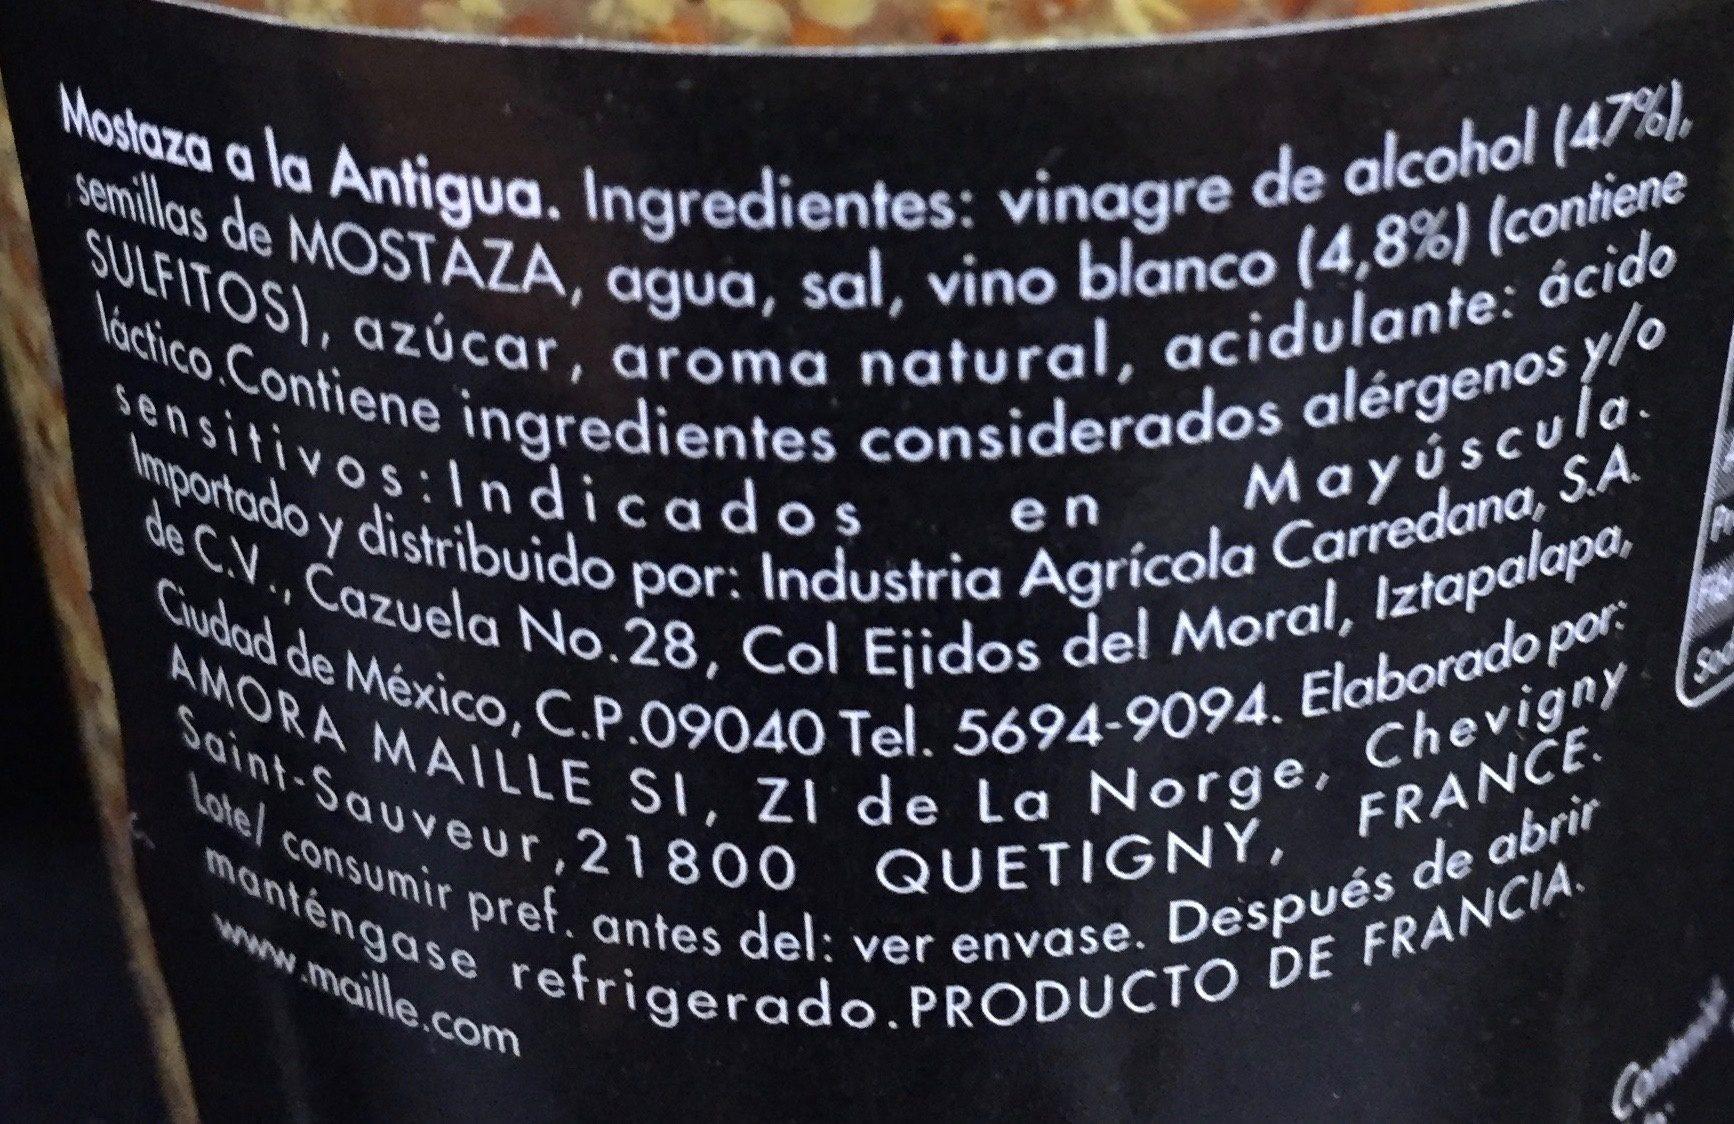 Mostaza a la Antigua àl Ancienne - Ingredientes